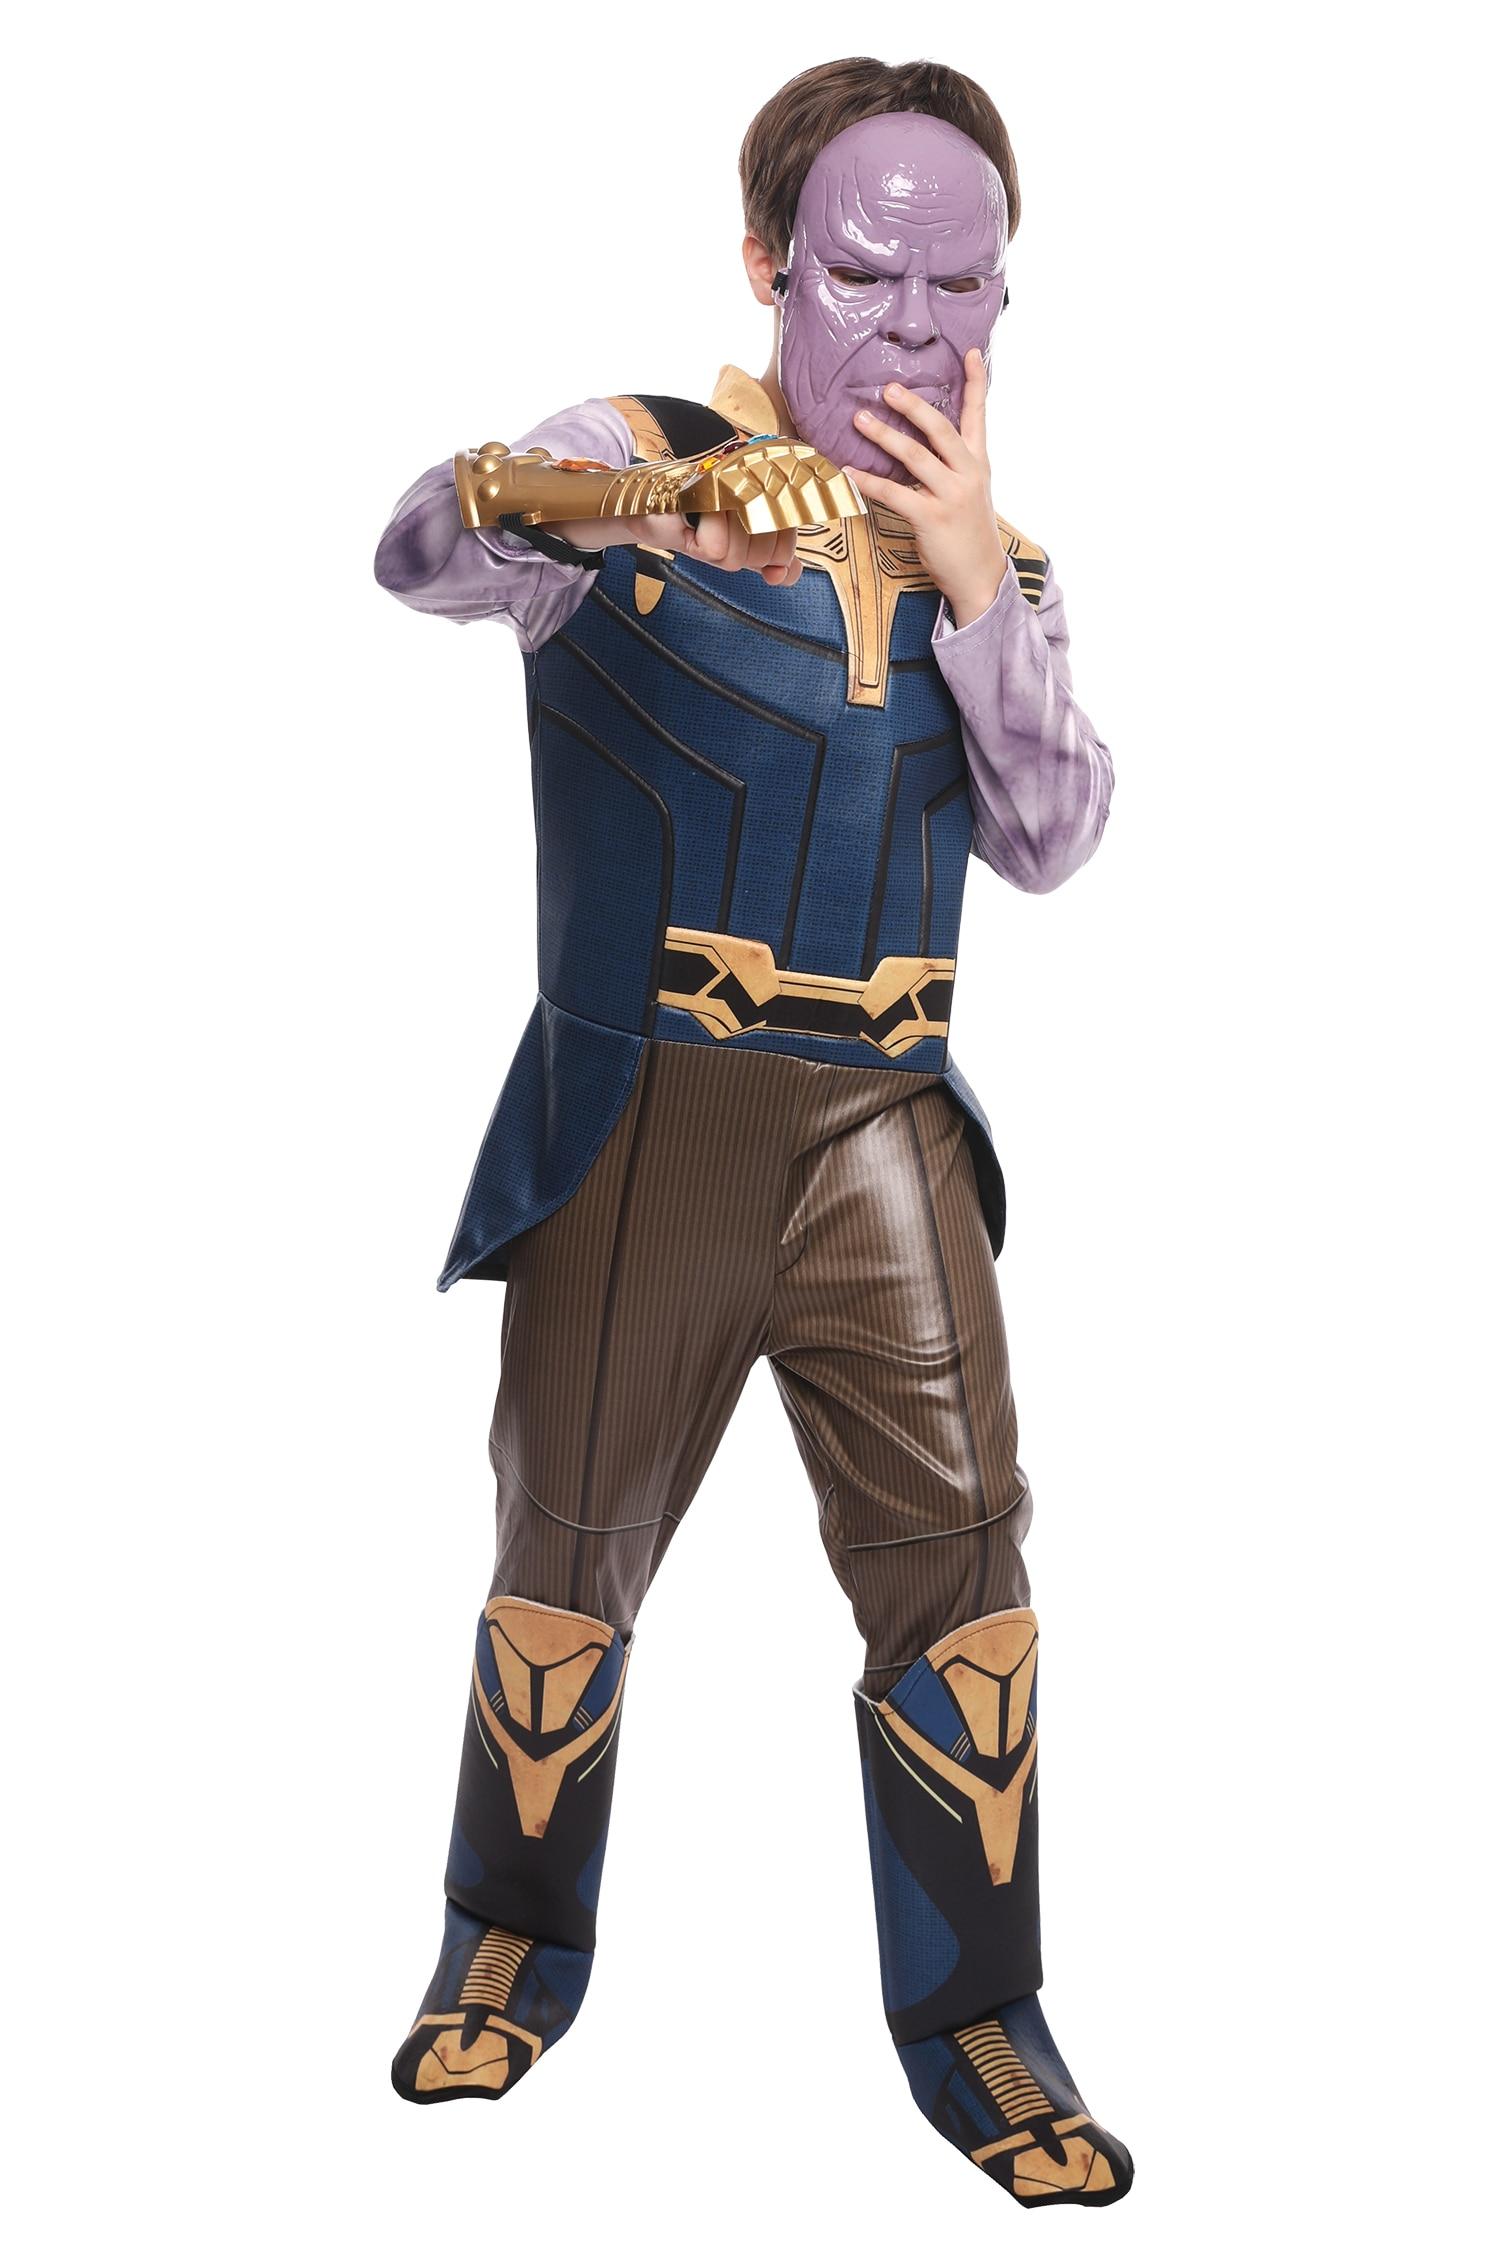 Halloween Boy's Thanos Cosplay Costume Captain America Superhero Iron Man Fantasia Outfit